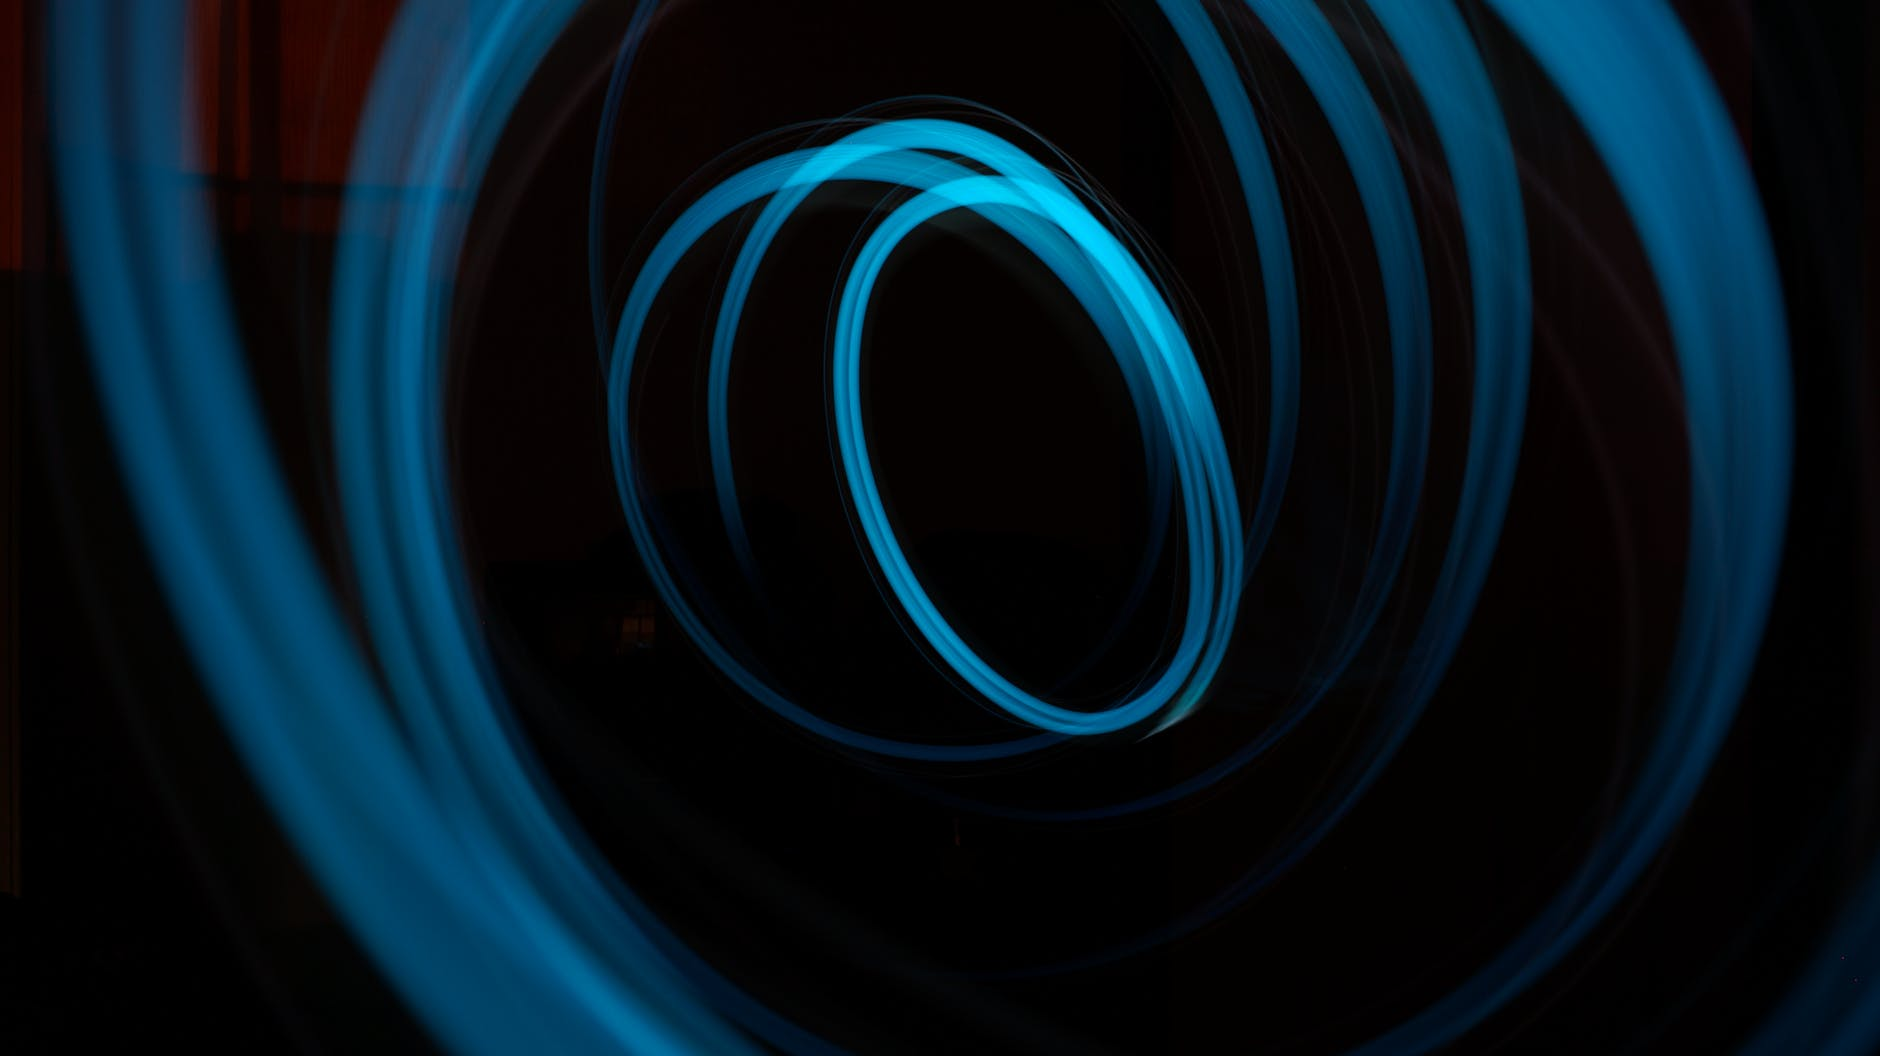 blue whirl illustration